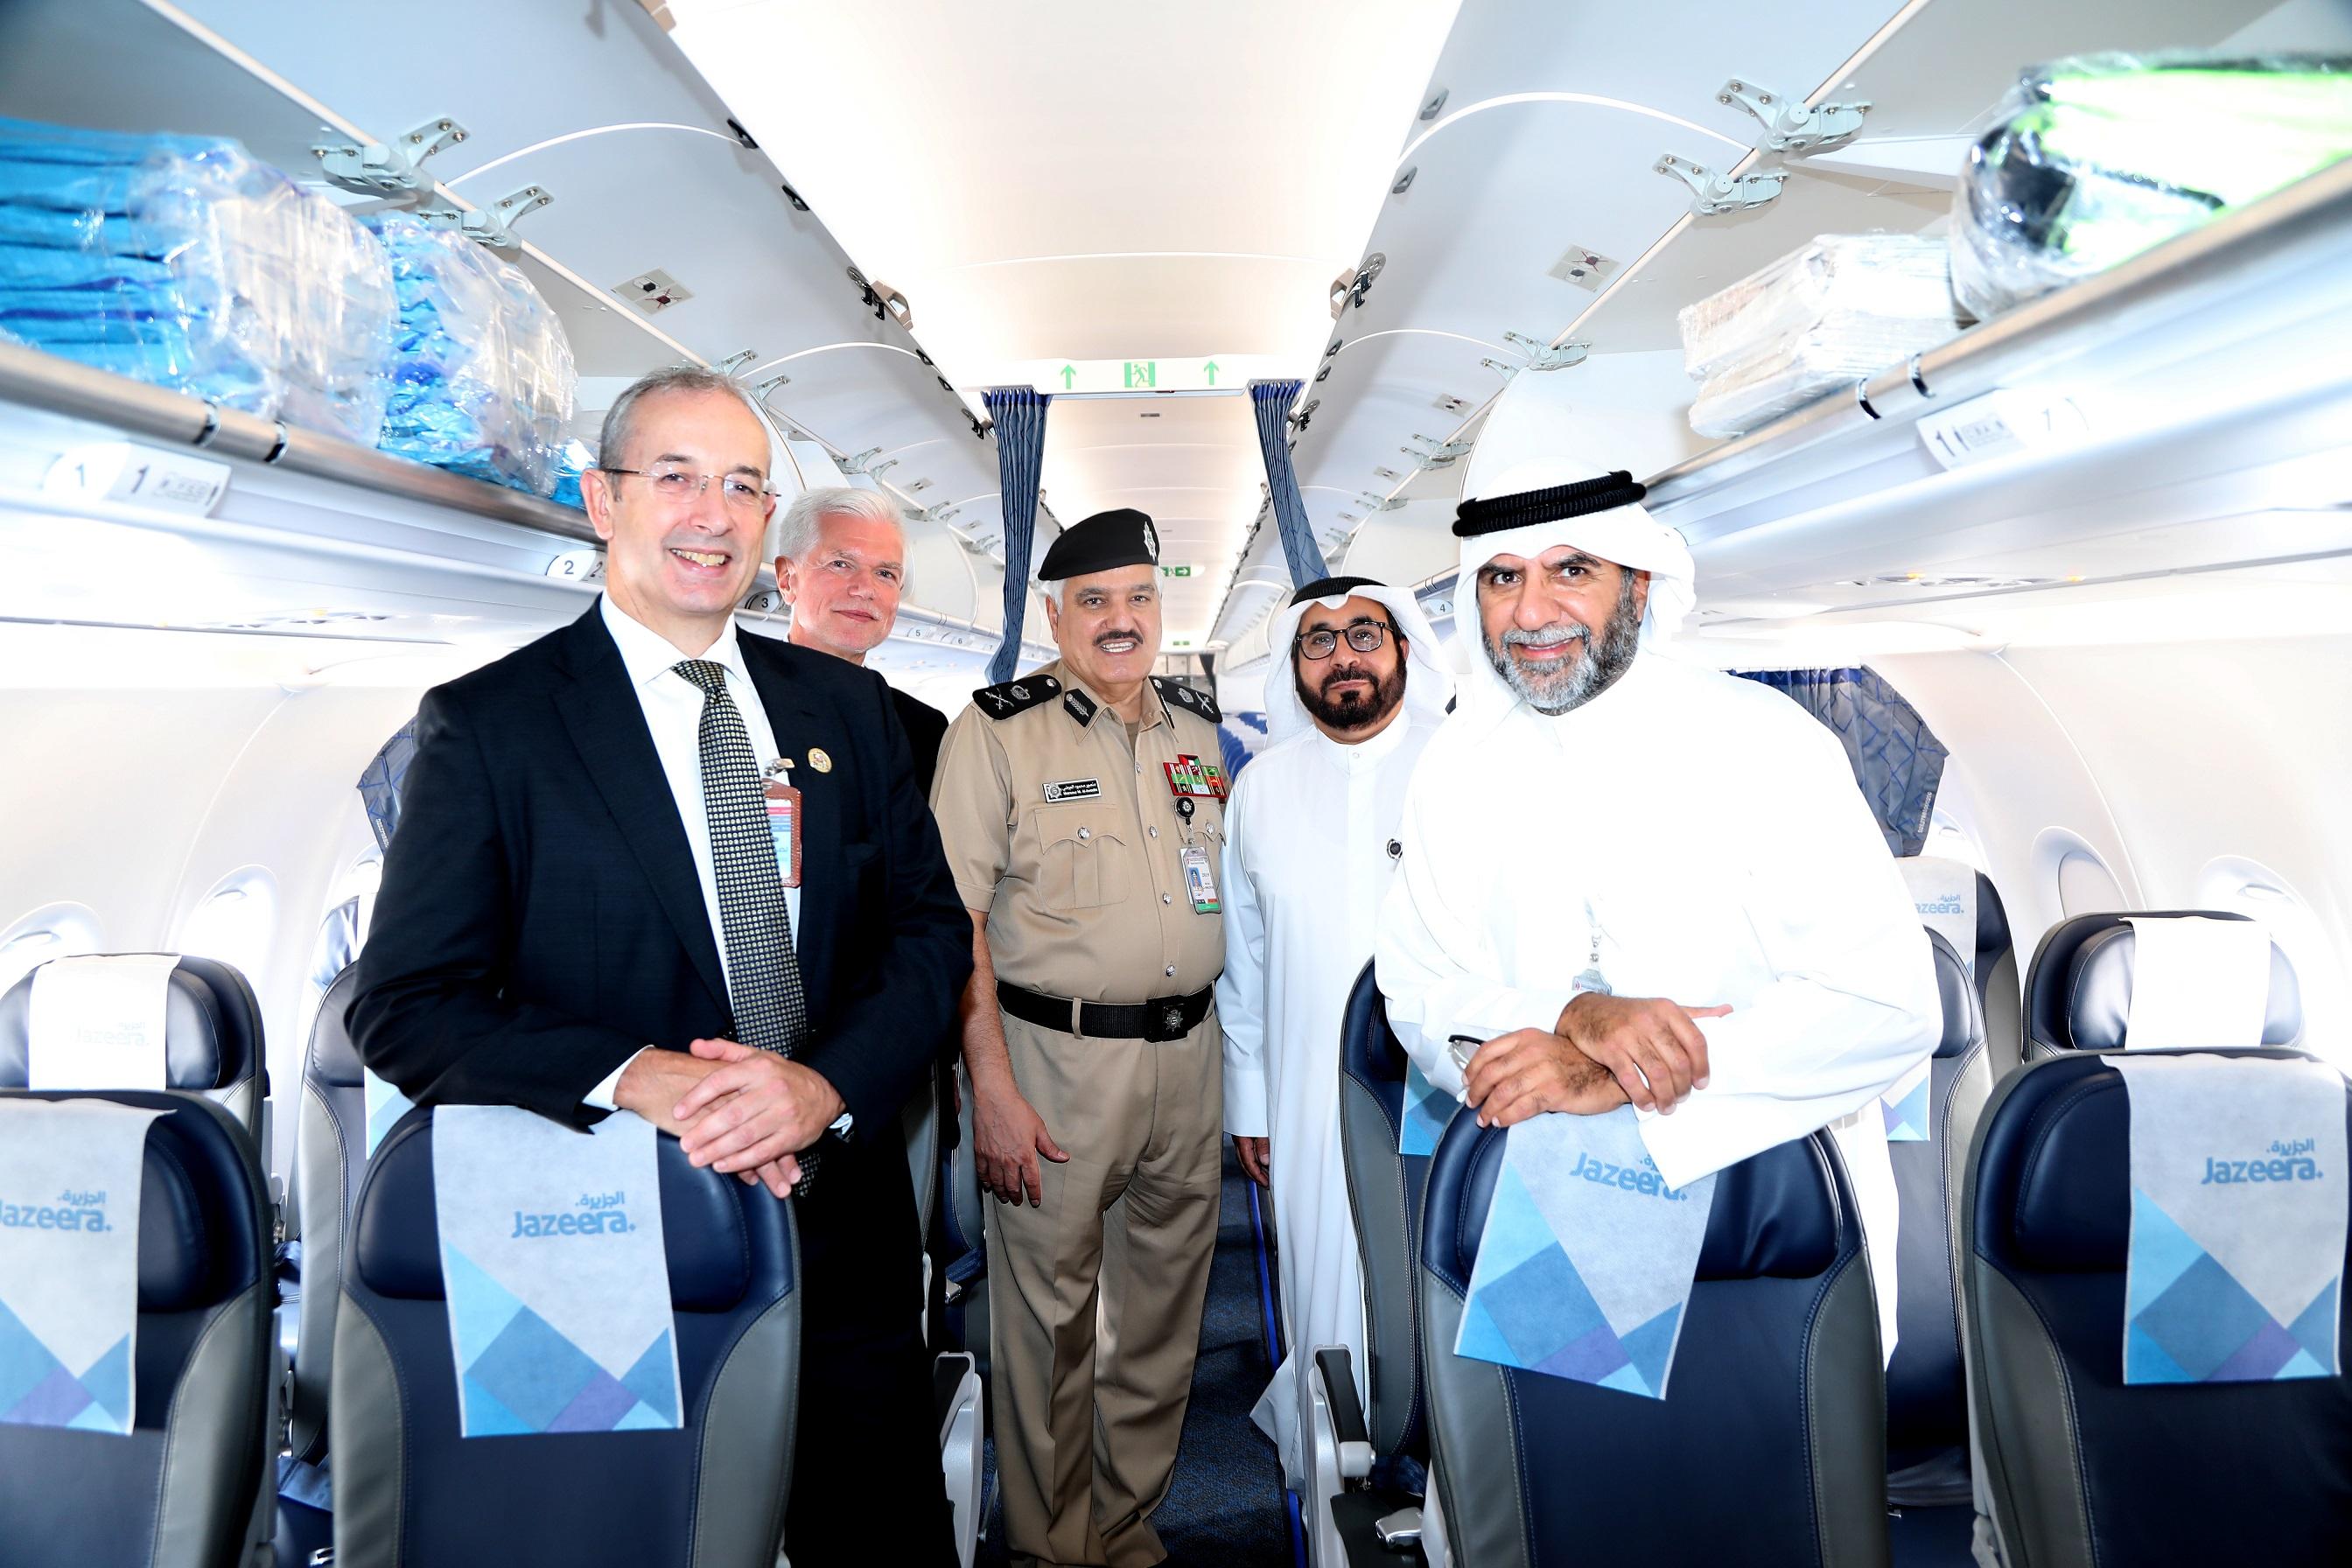 Jazeera Airways launches first flight to London